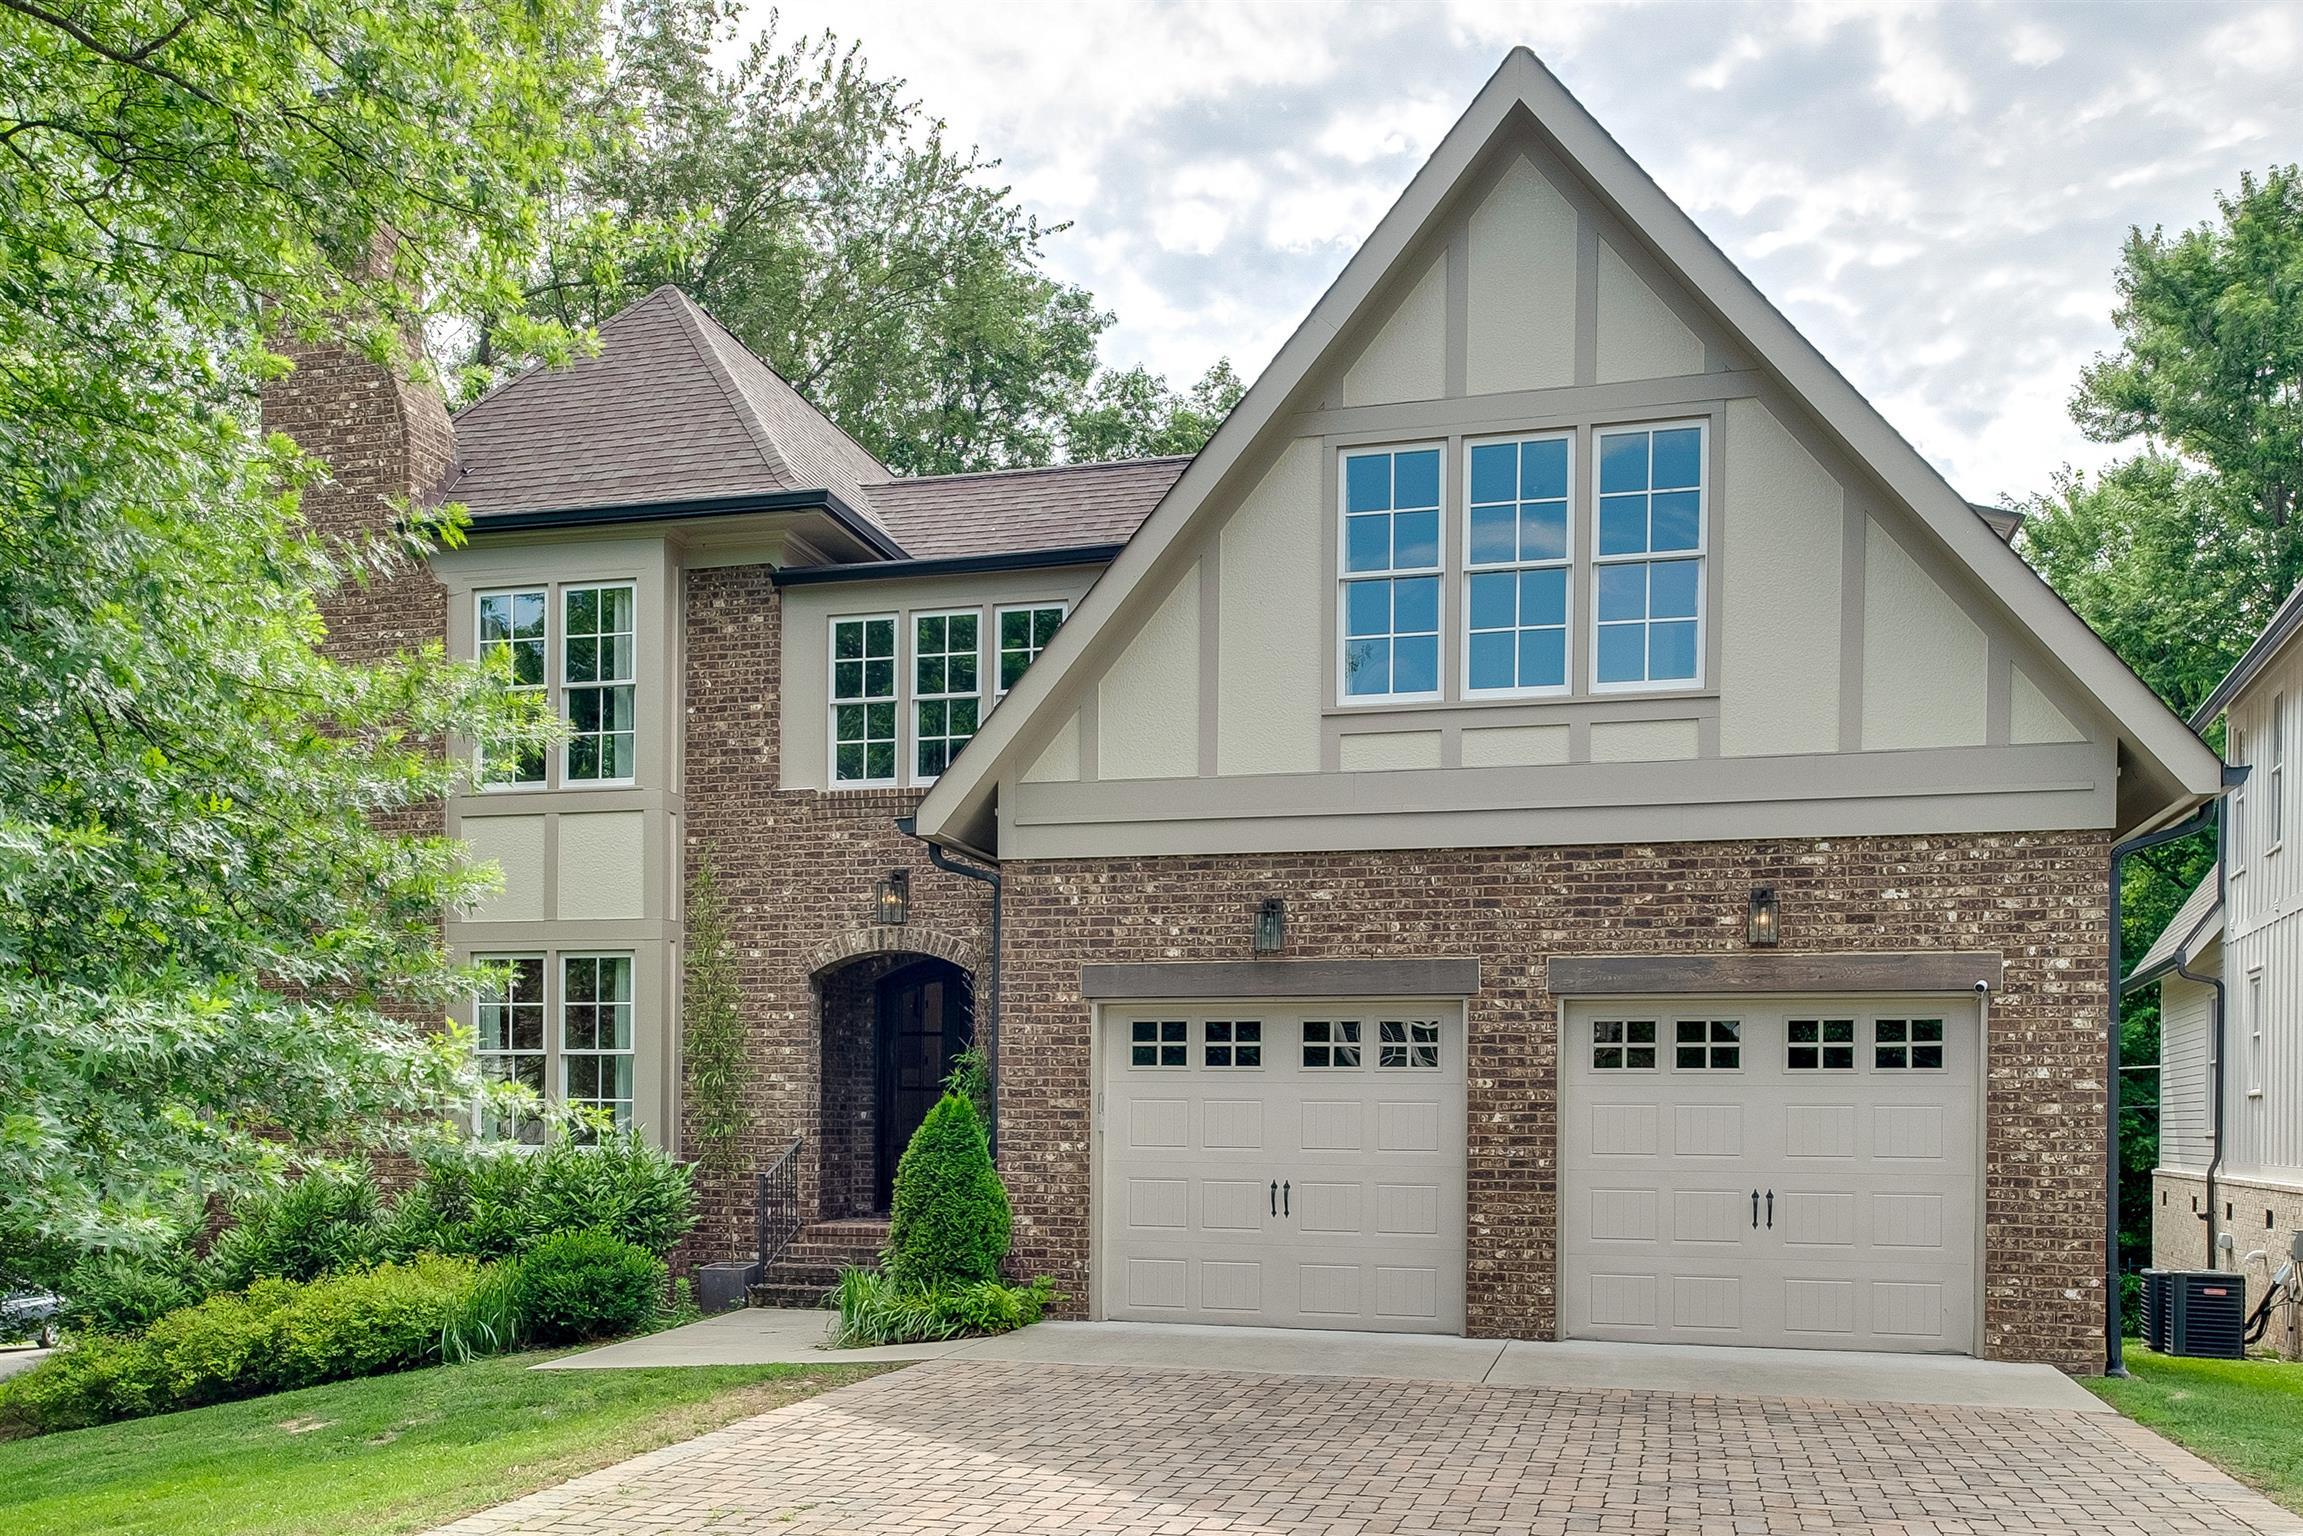 4303B Dale Ave, Nashville, TN 37204 - Nashville, TN real estate listing